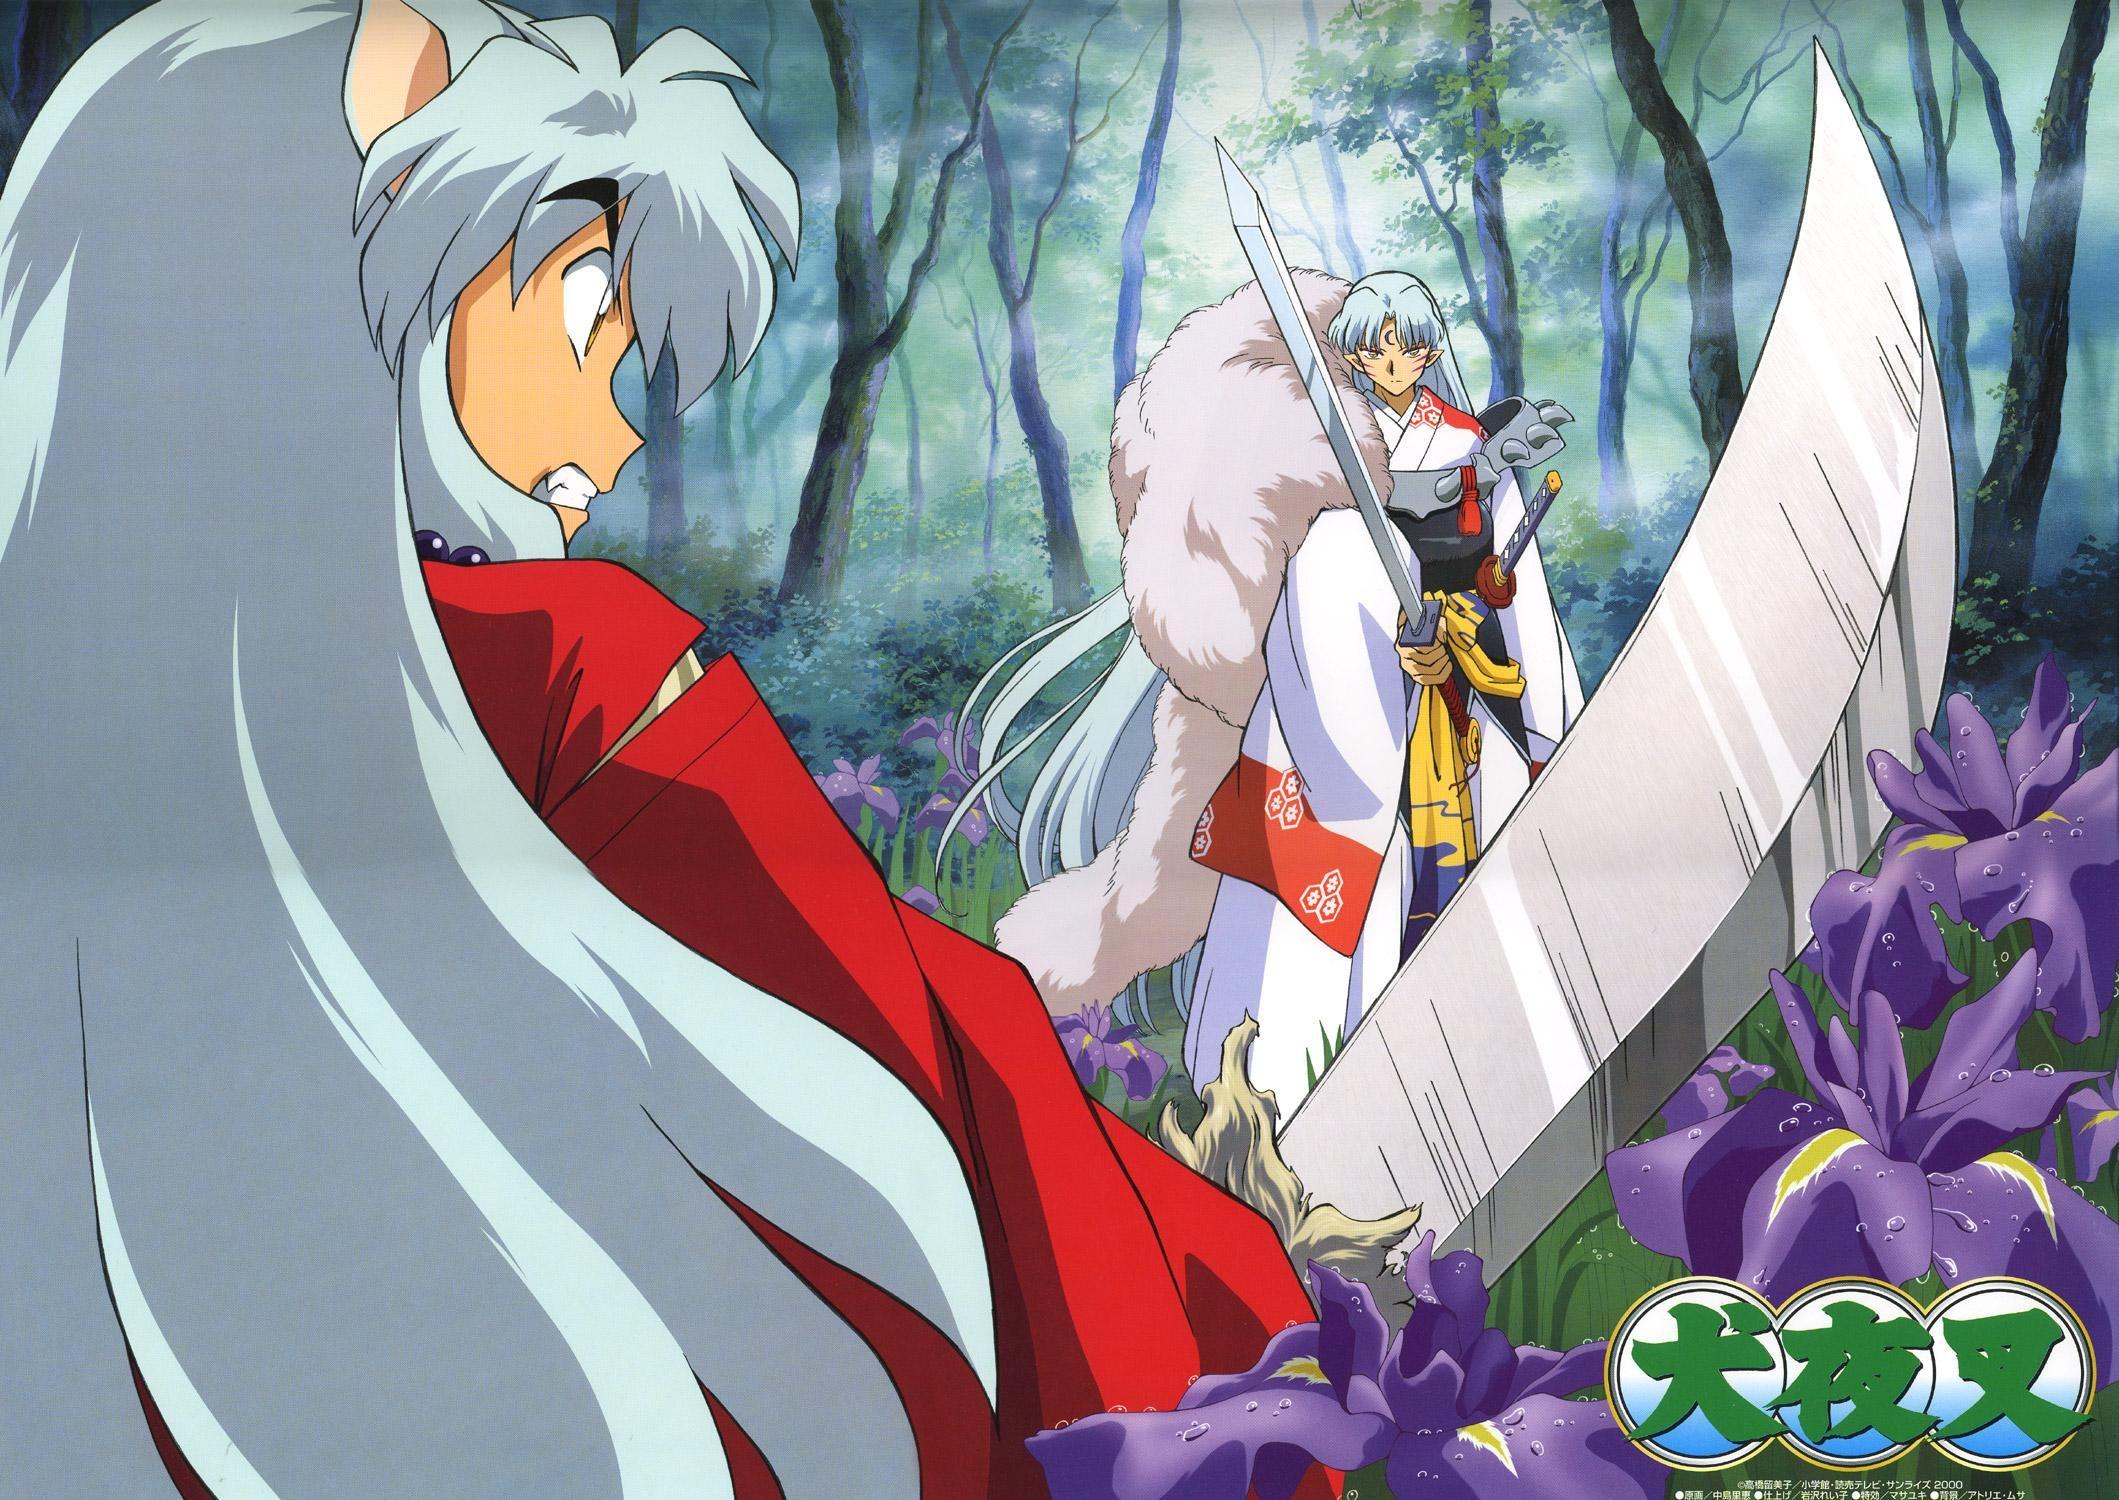 Inuyasha And Sesshomaru About To Battle Inuyasha Official Artwork